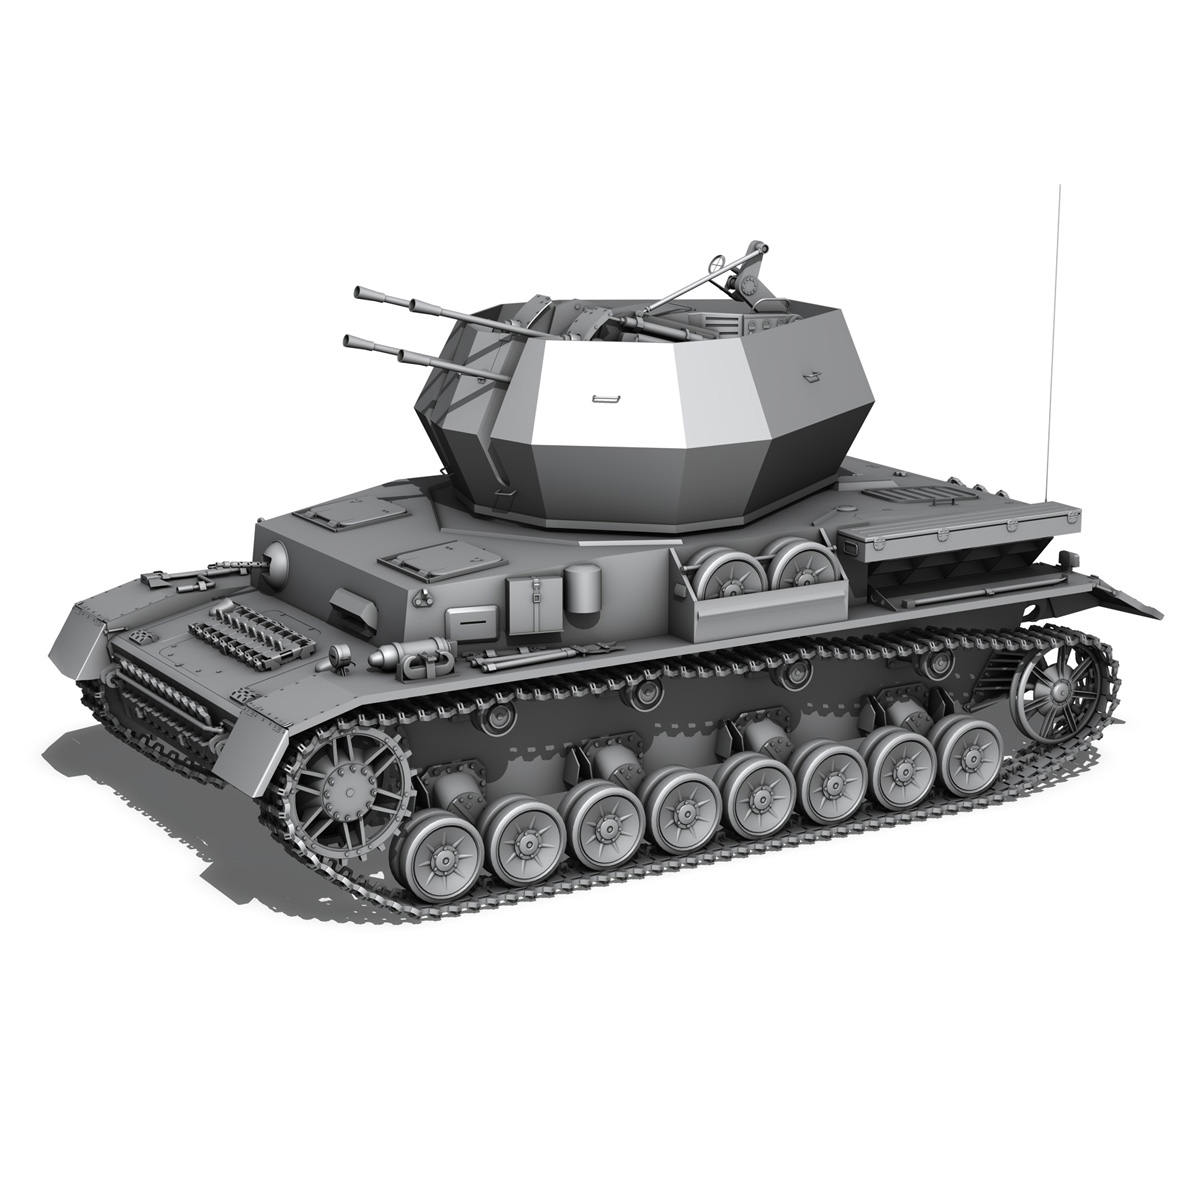 flakpanzer iv – wirbelwind – spzjgabt 654 3d model 3ds fbx c4d lwo obj 282316